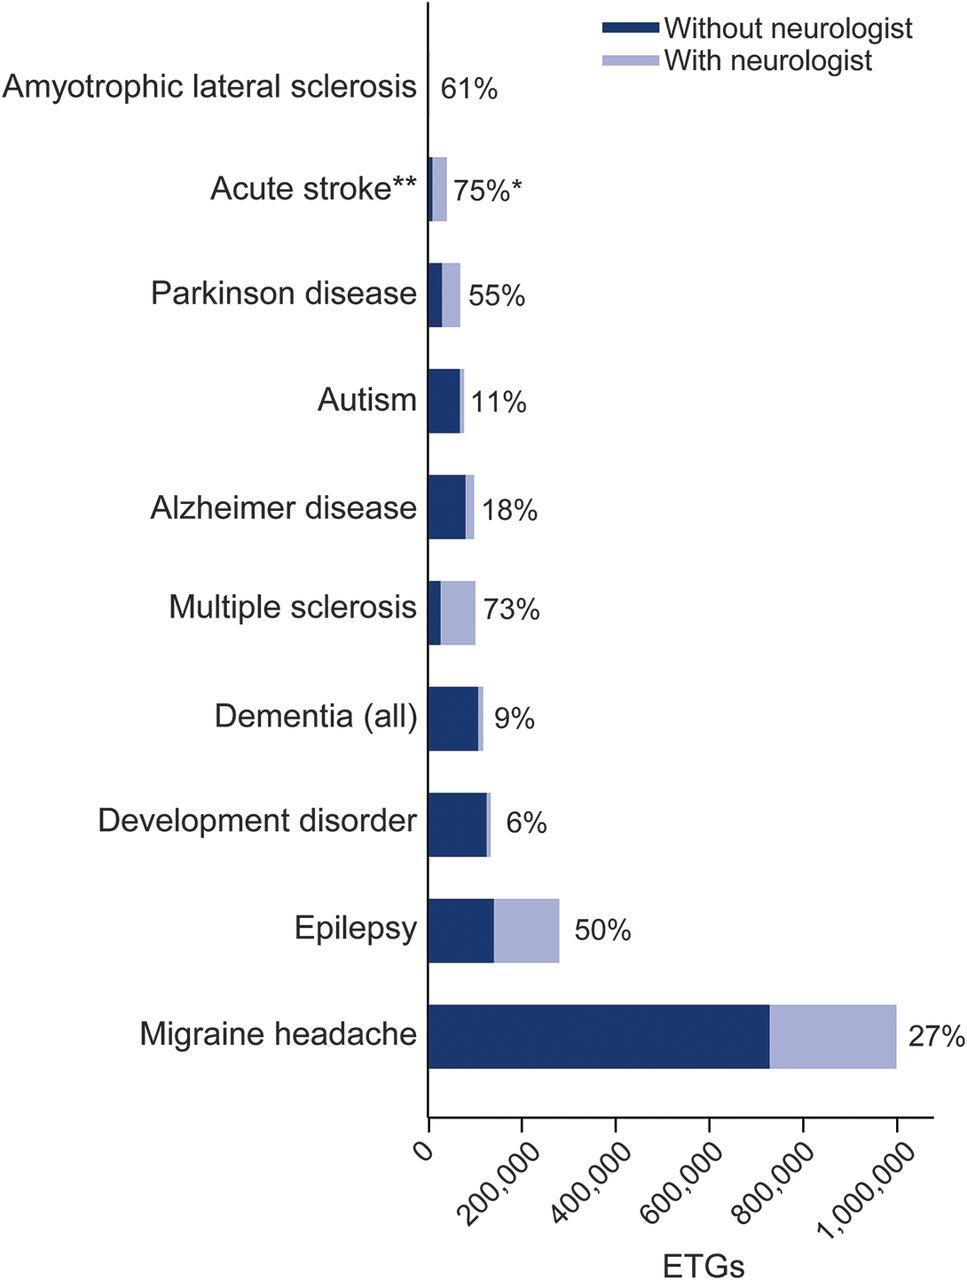 Neurologist ambulatory care, health care utilization, and